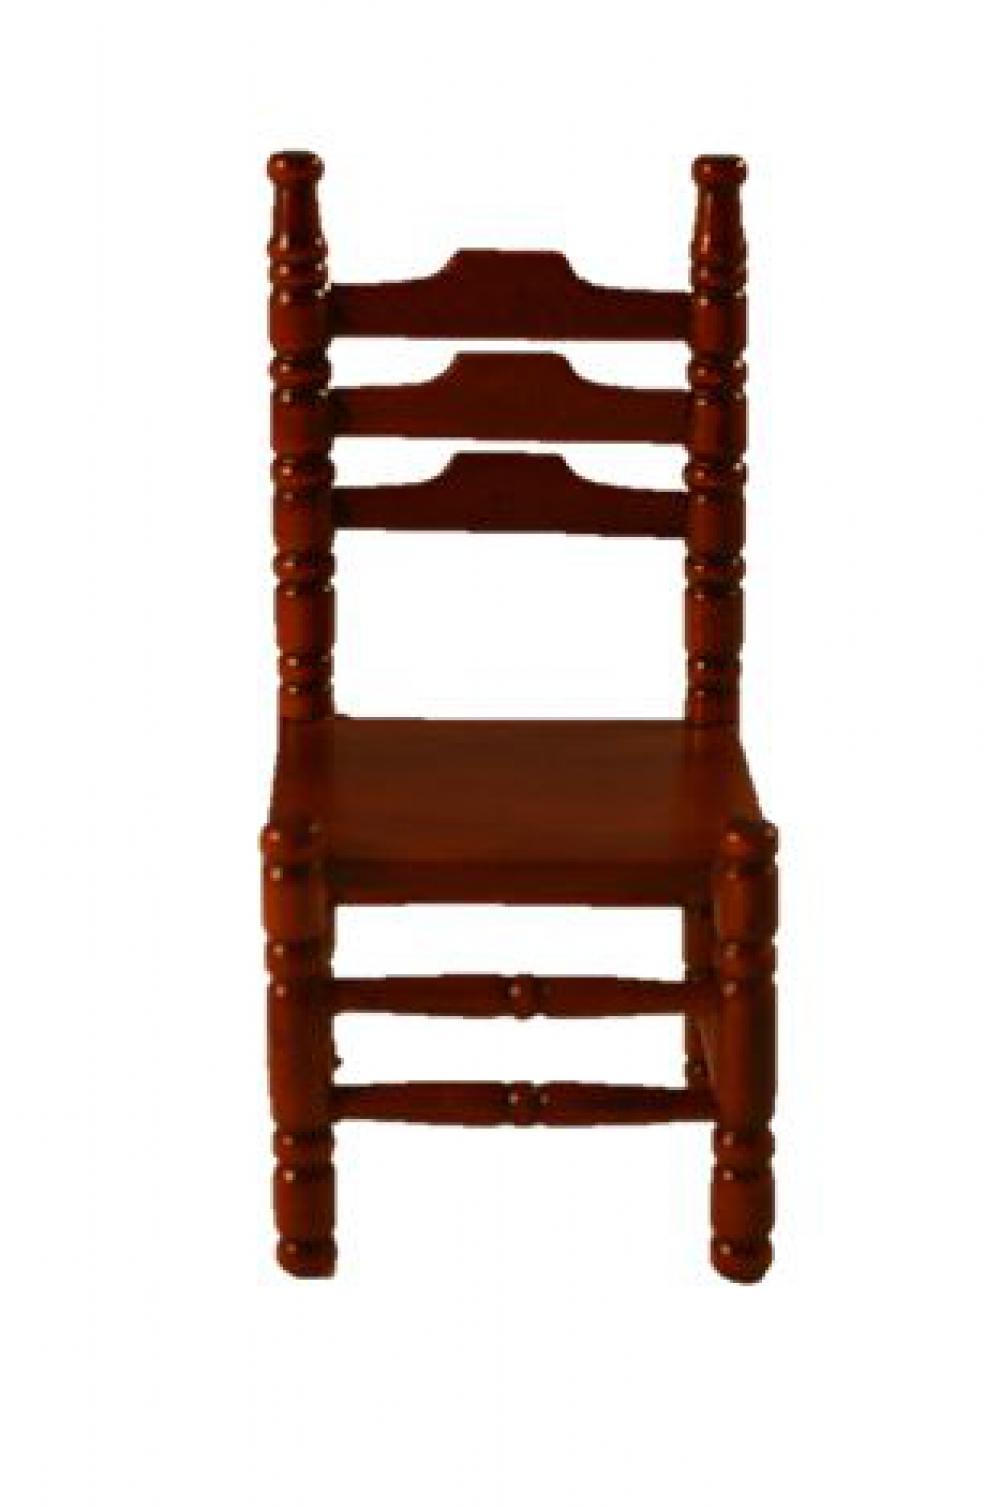 puppenstuhl holzstuhl 4x8cm mahagoni ebay. Black Bedroom Furniture Sets. Home Design Ideas